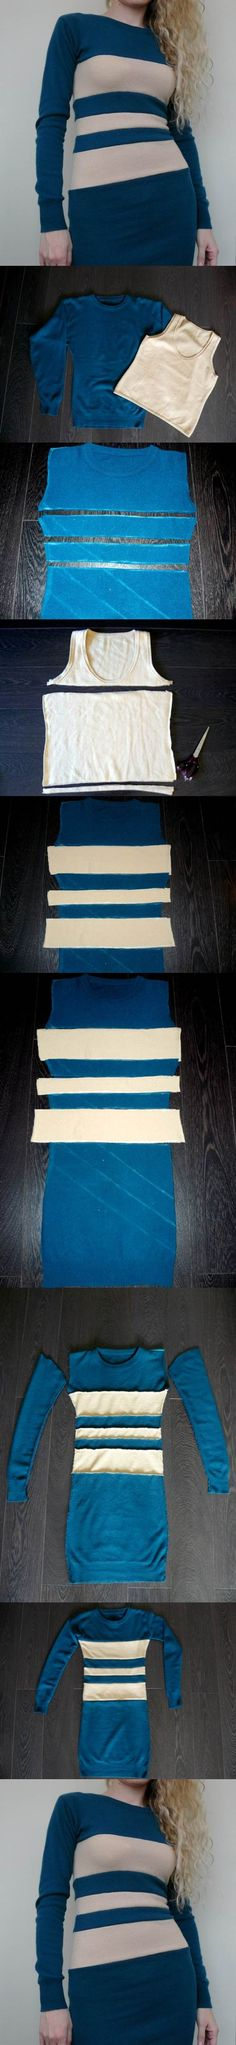 DIY Color Block Dress from Sweatshirt and Tank | iCreativeIdeas.com Like Us on Facebook ==> https://www.facebook.com/icreativeideas